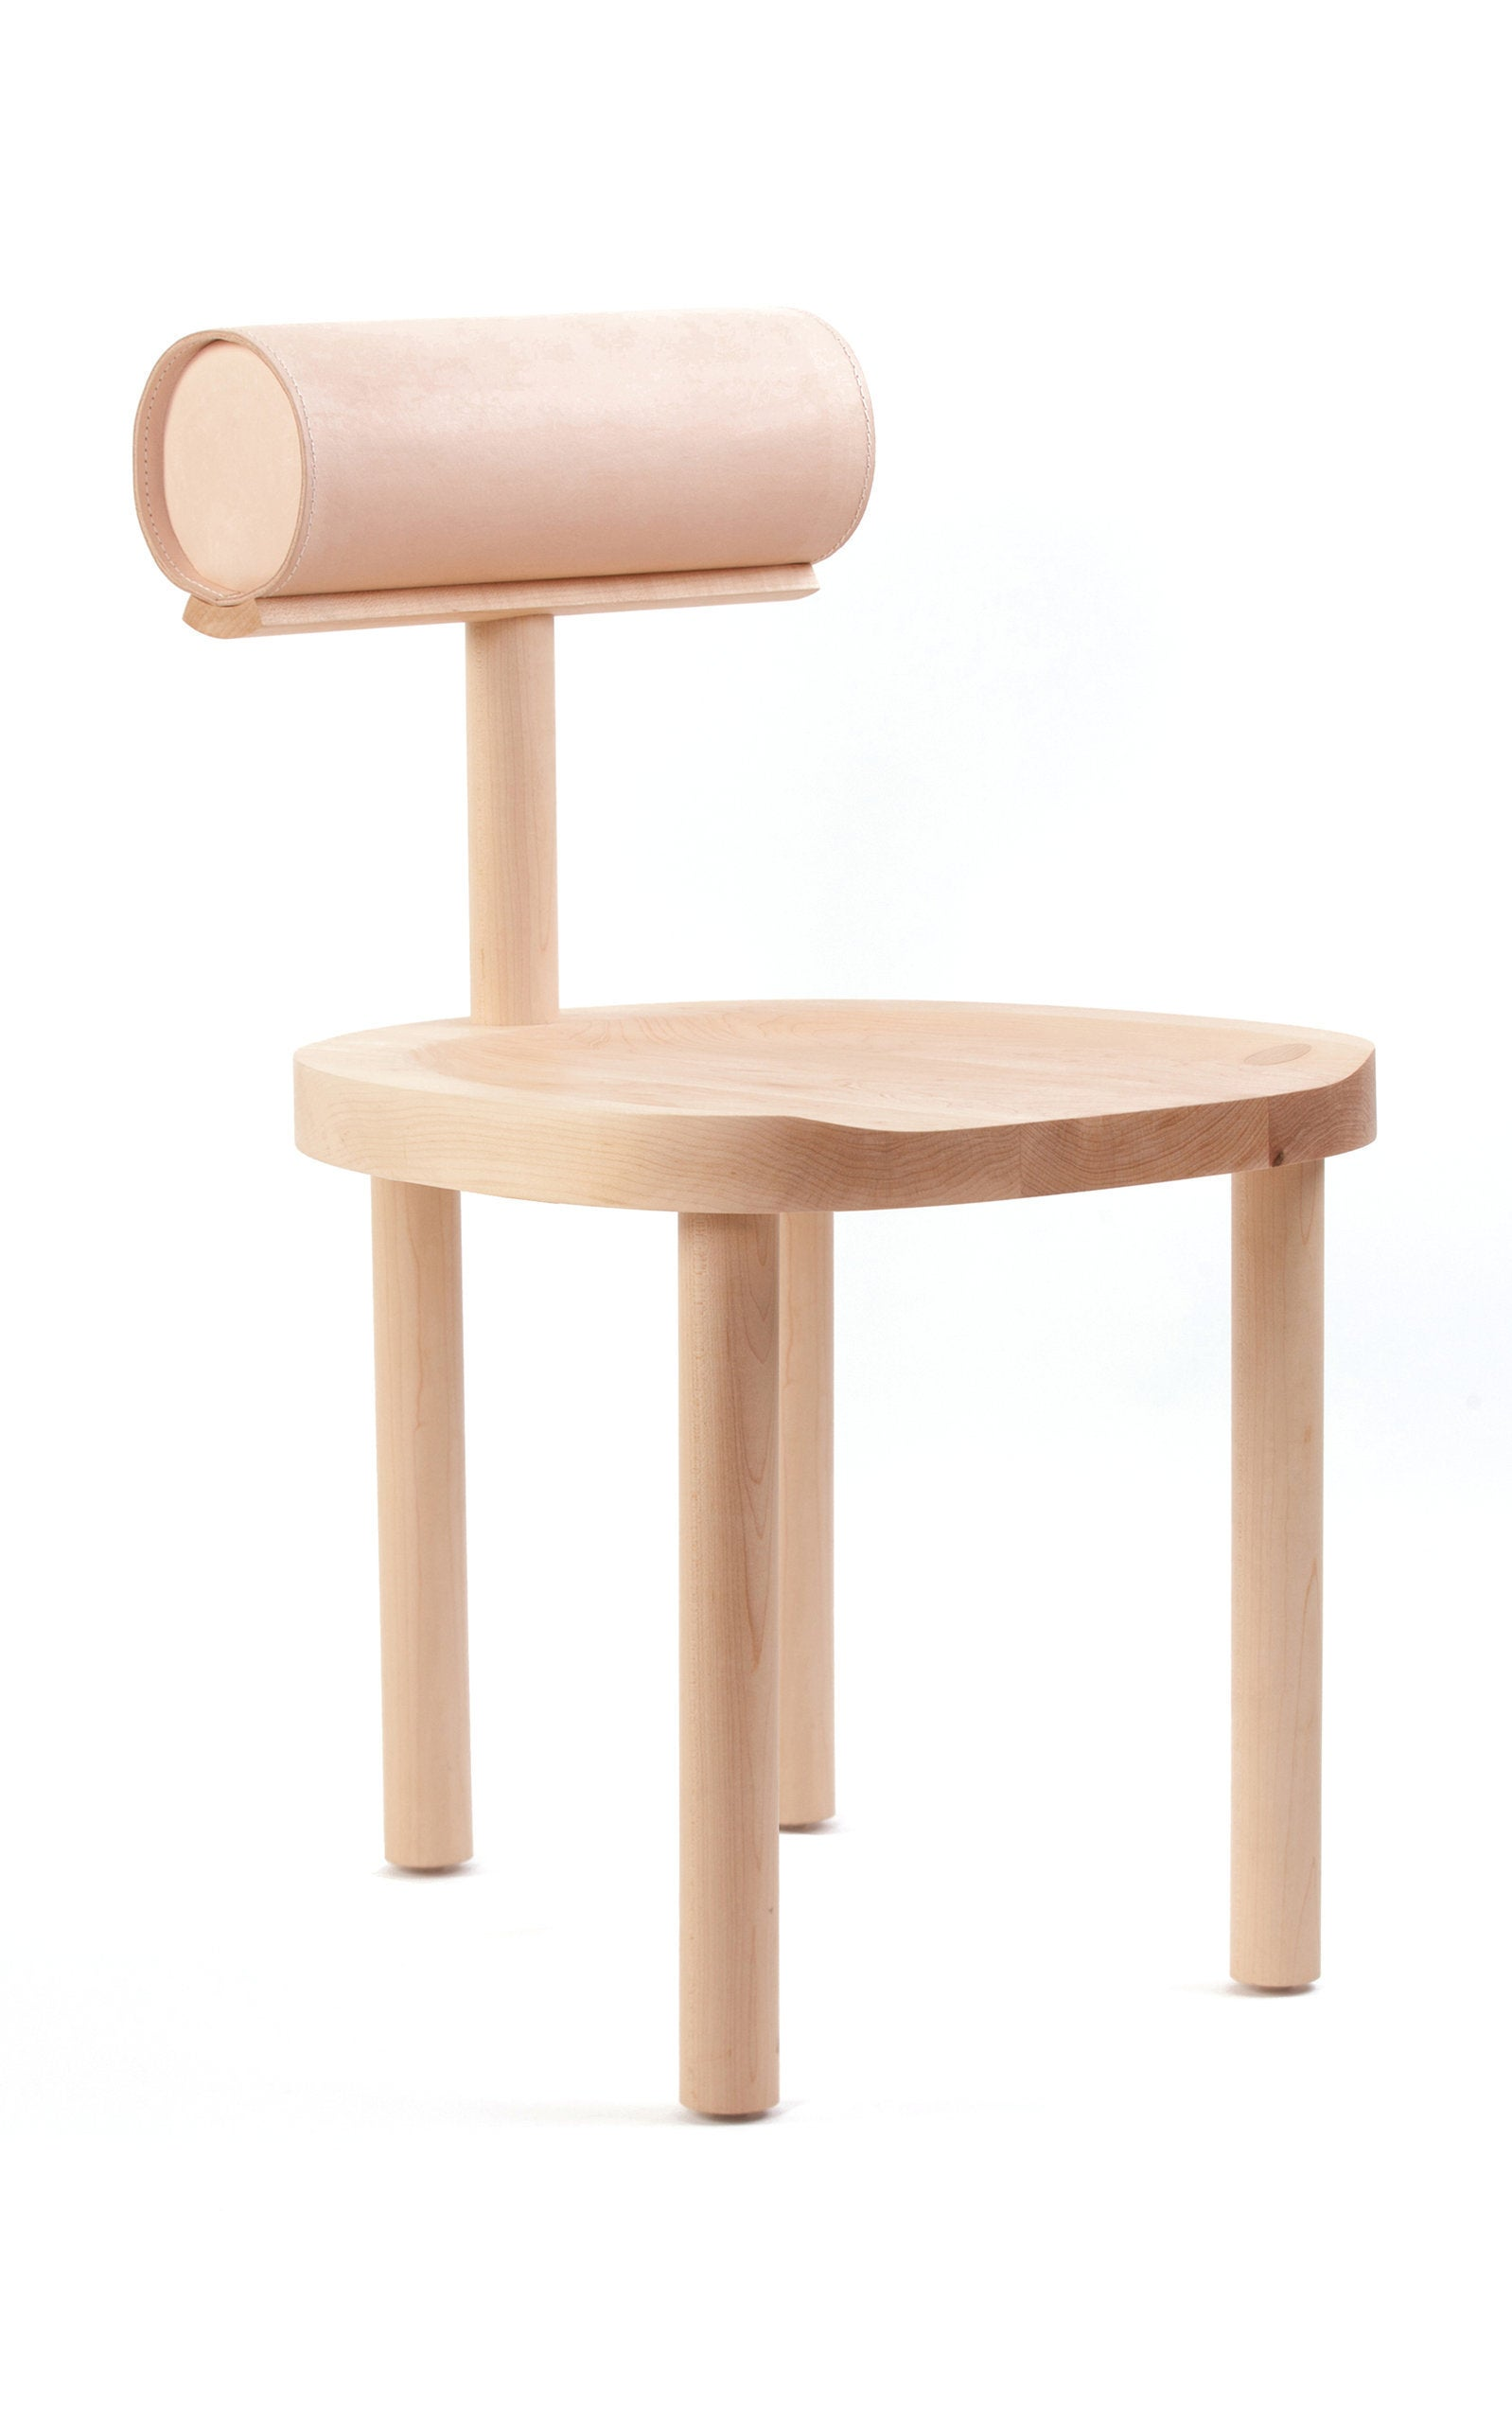 large_estudio-persona-neutral-una-chair